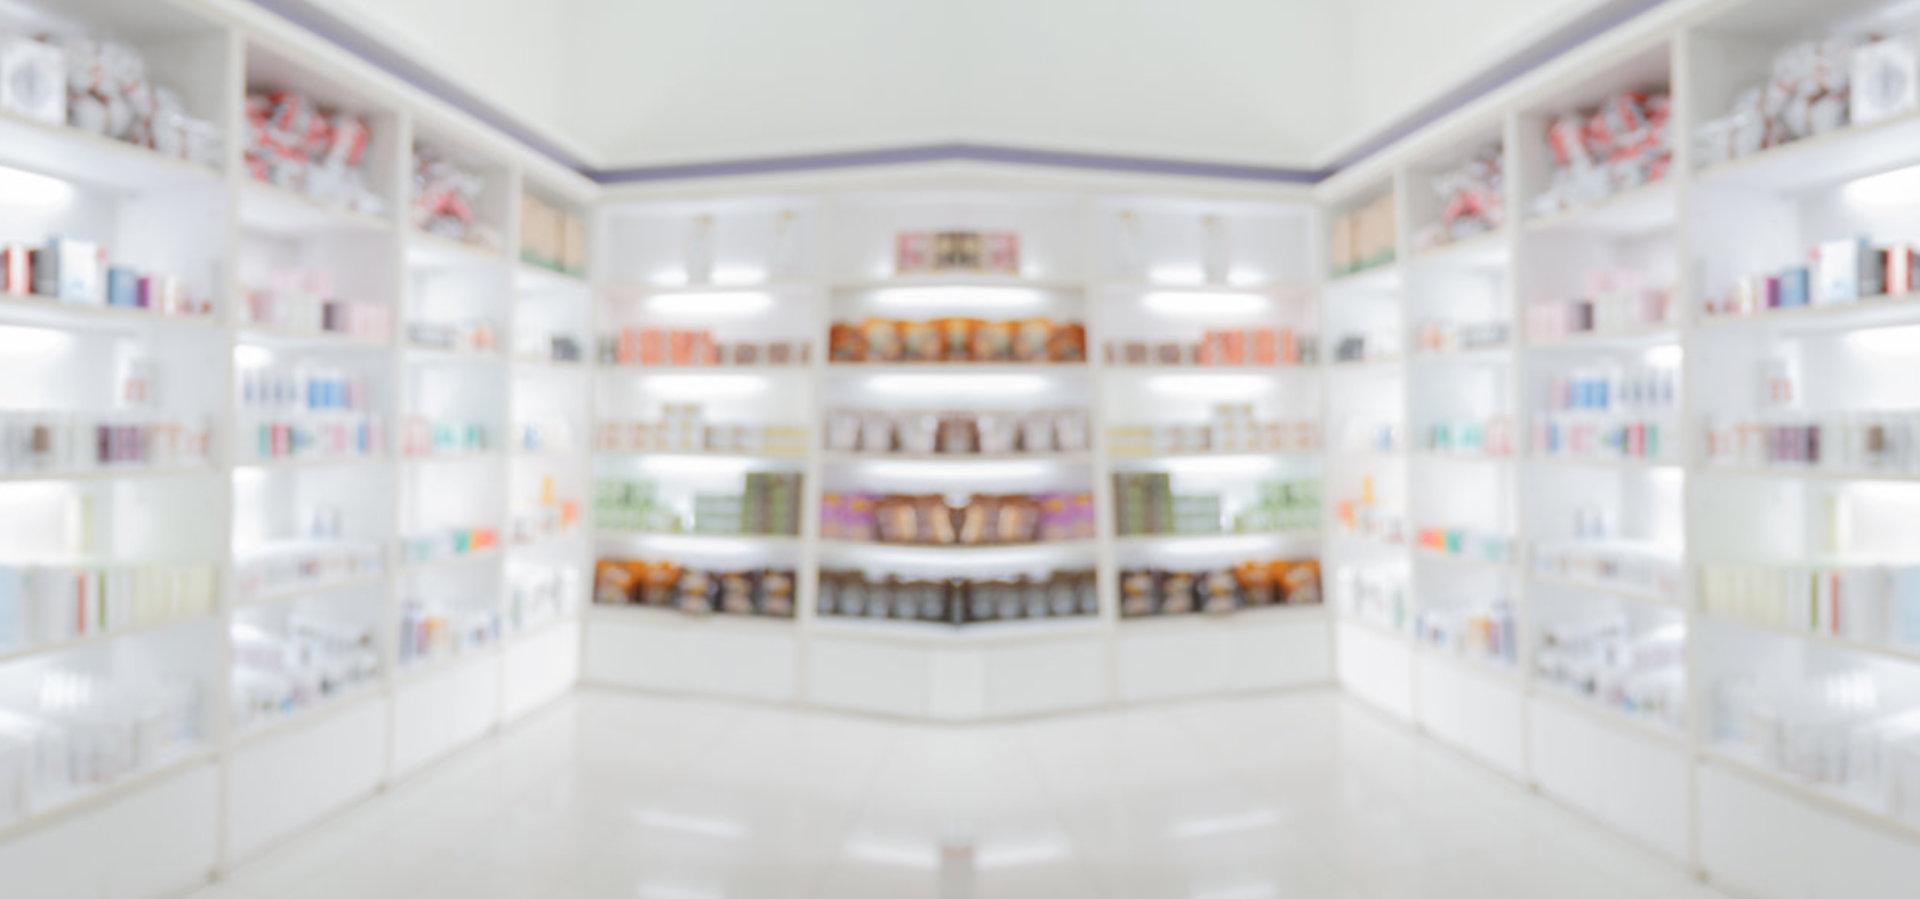 inside a pharmacy